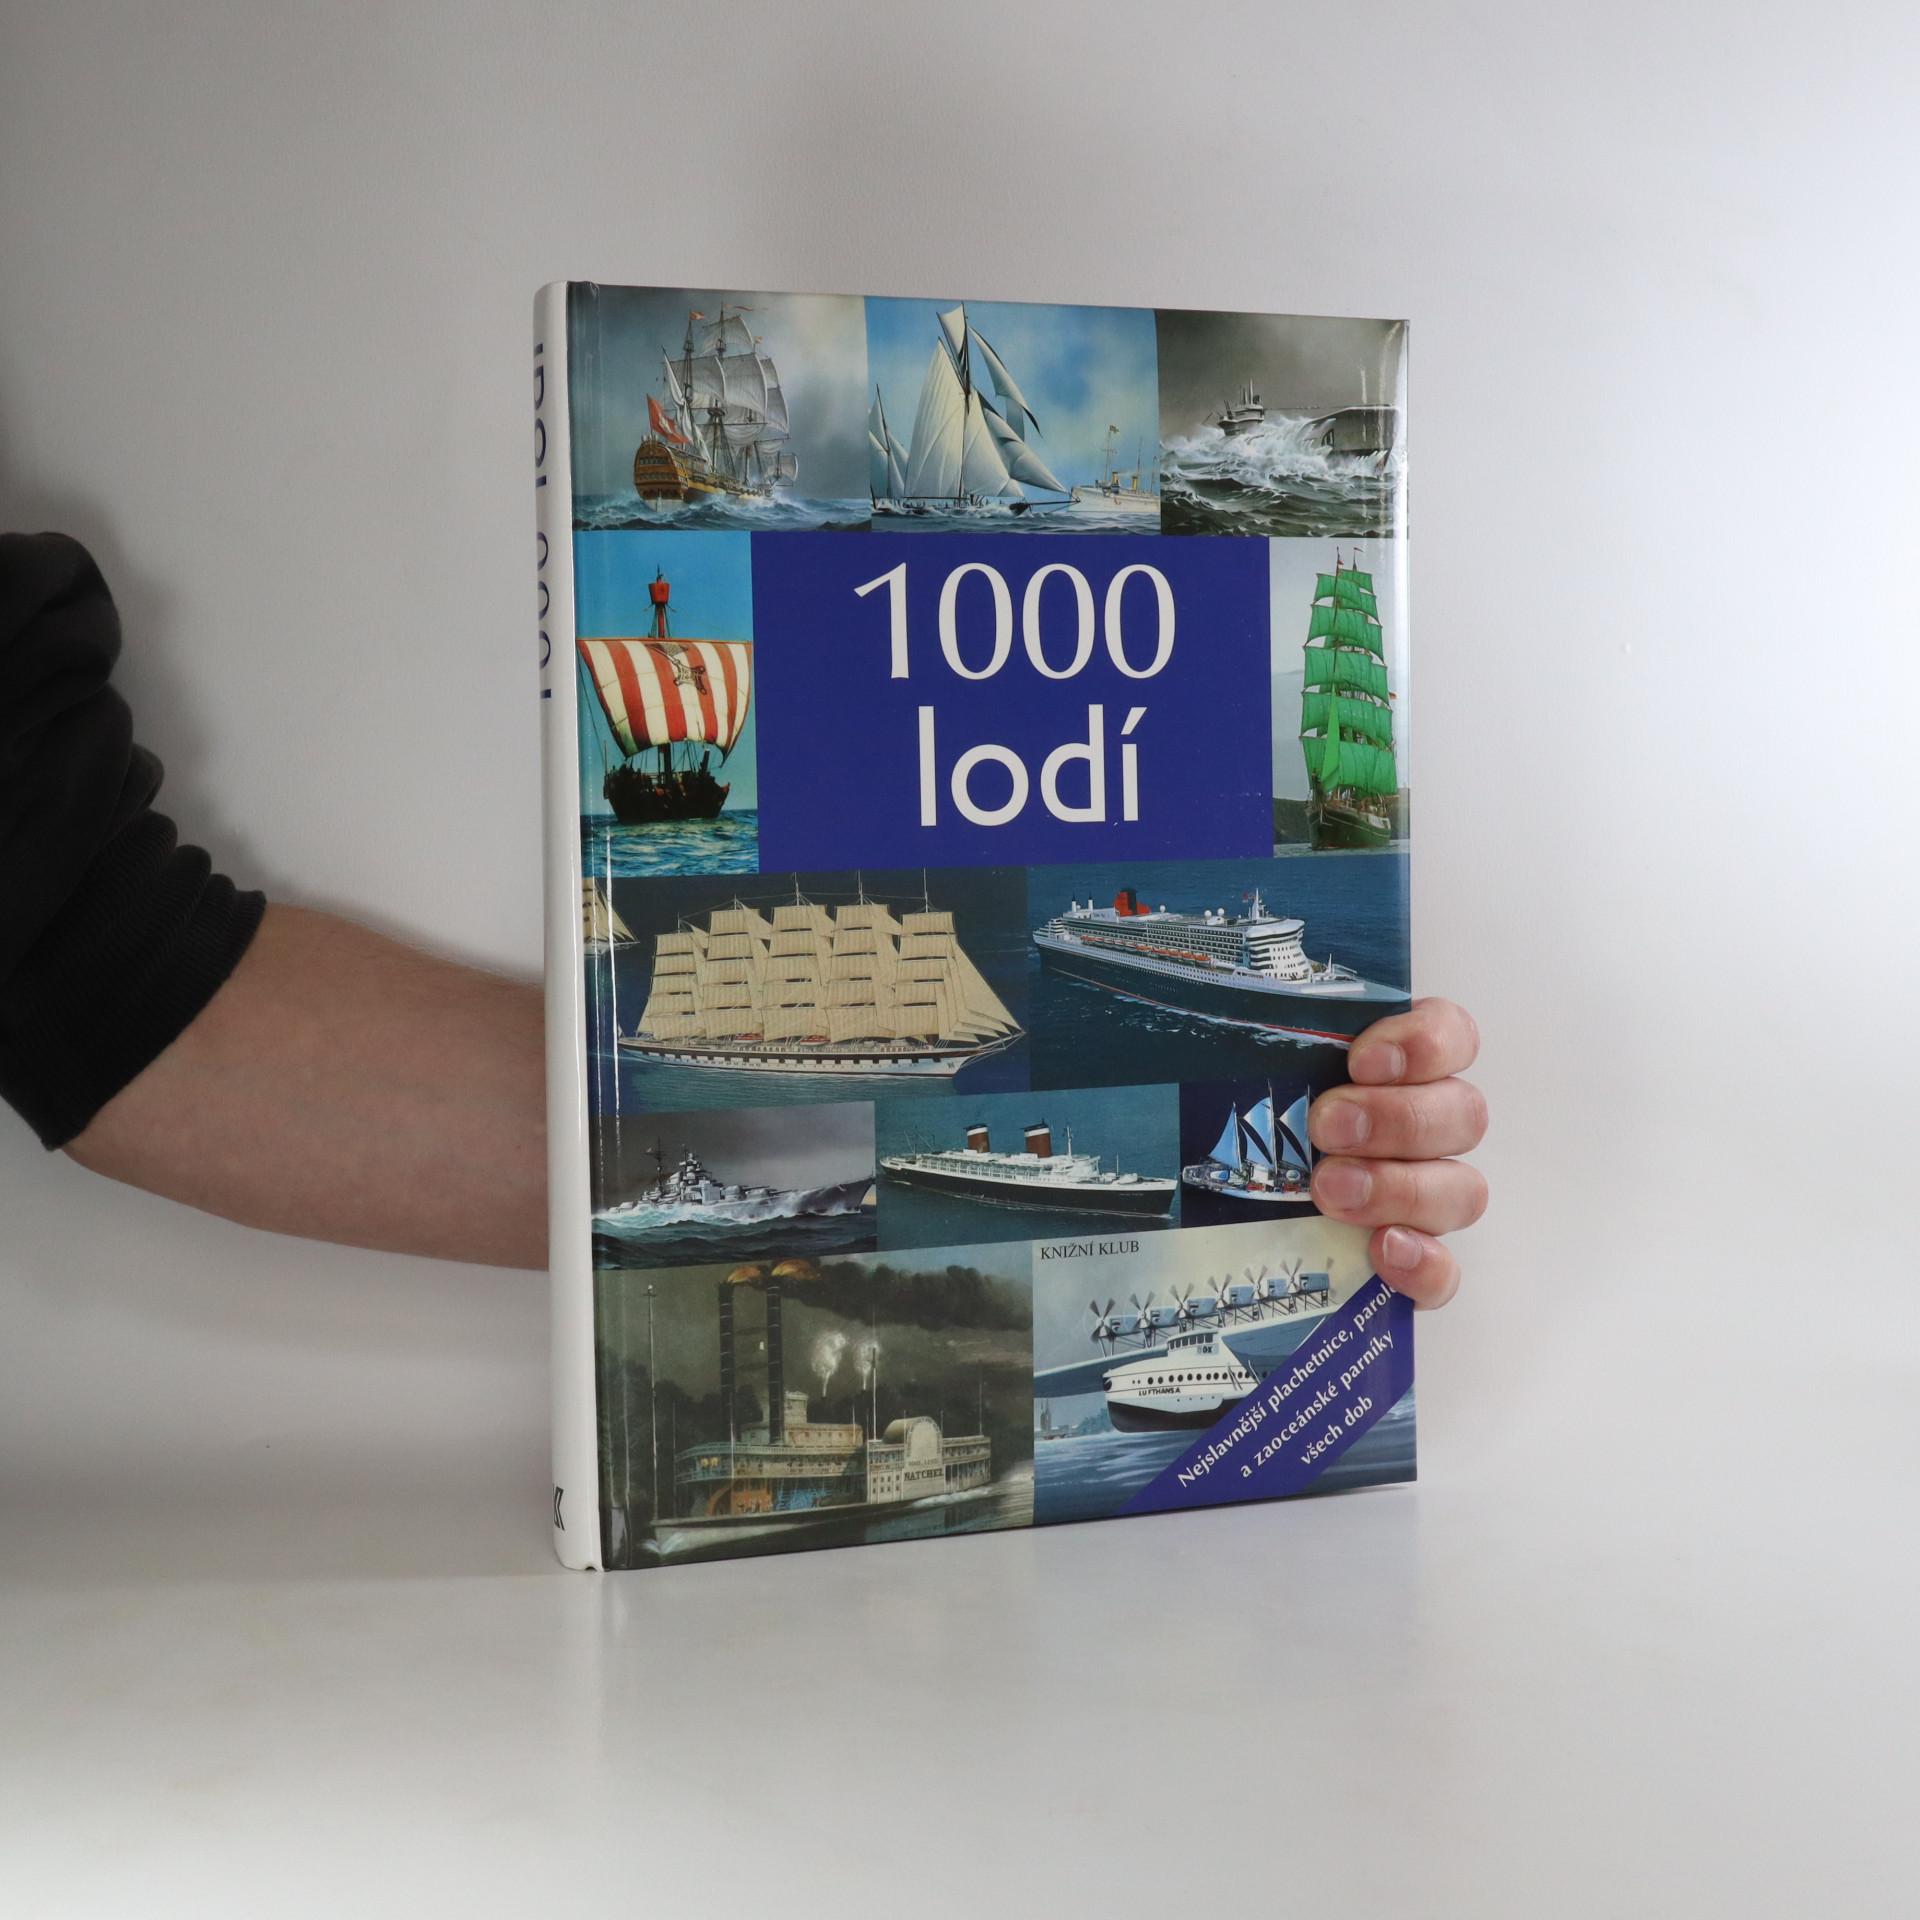 antikvární kniha 1000 lodí, 2007